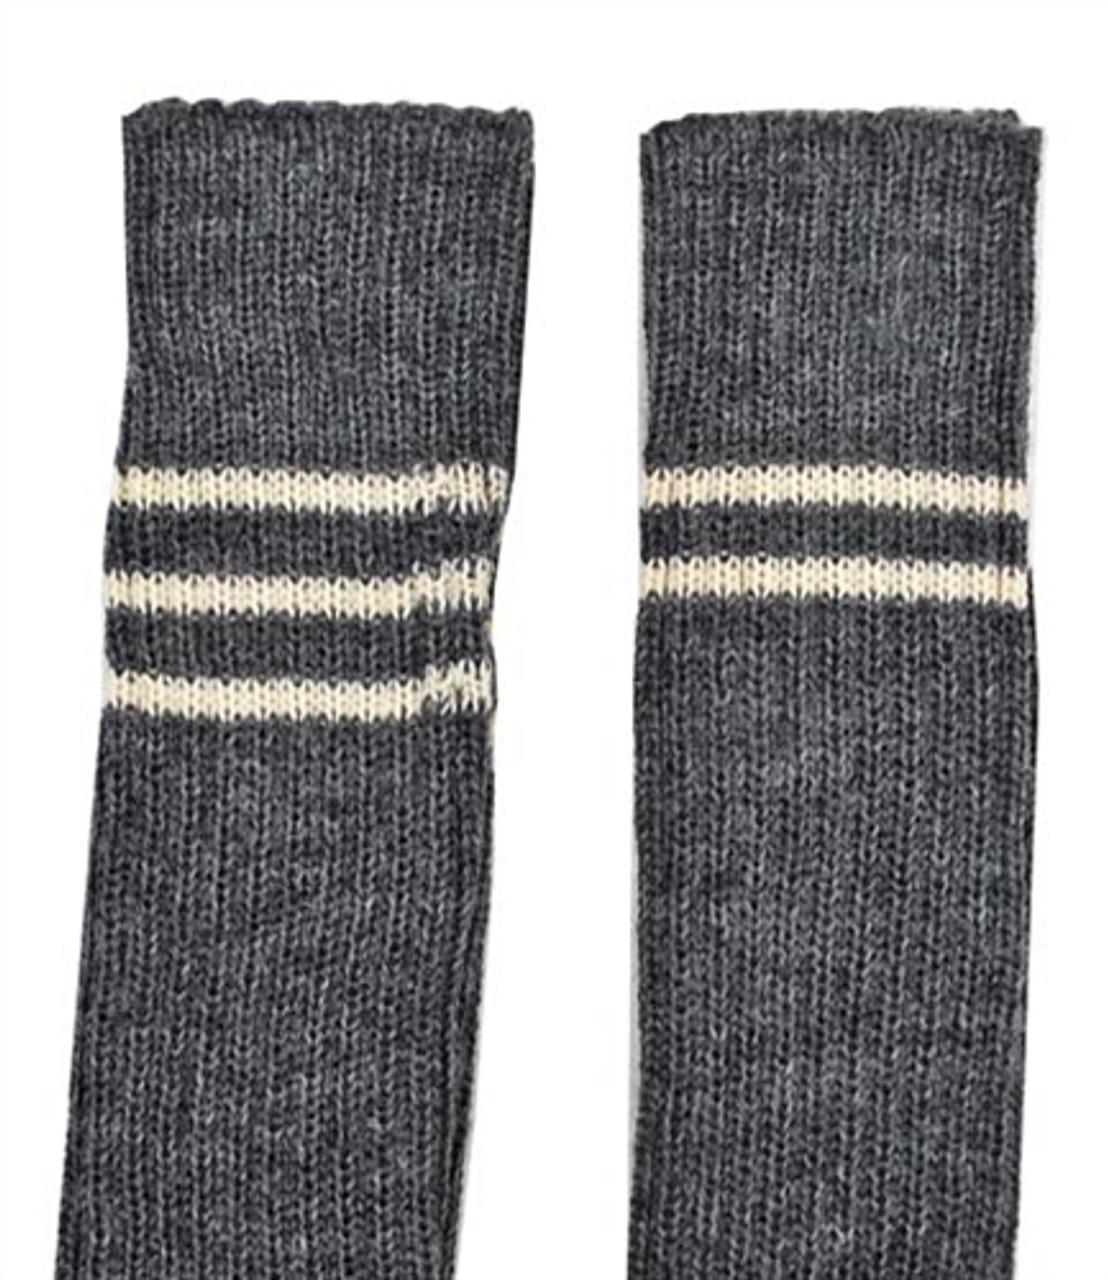 German Military Wool Socks from Hessen Antique